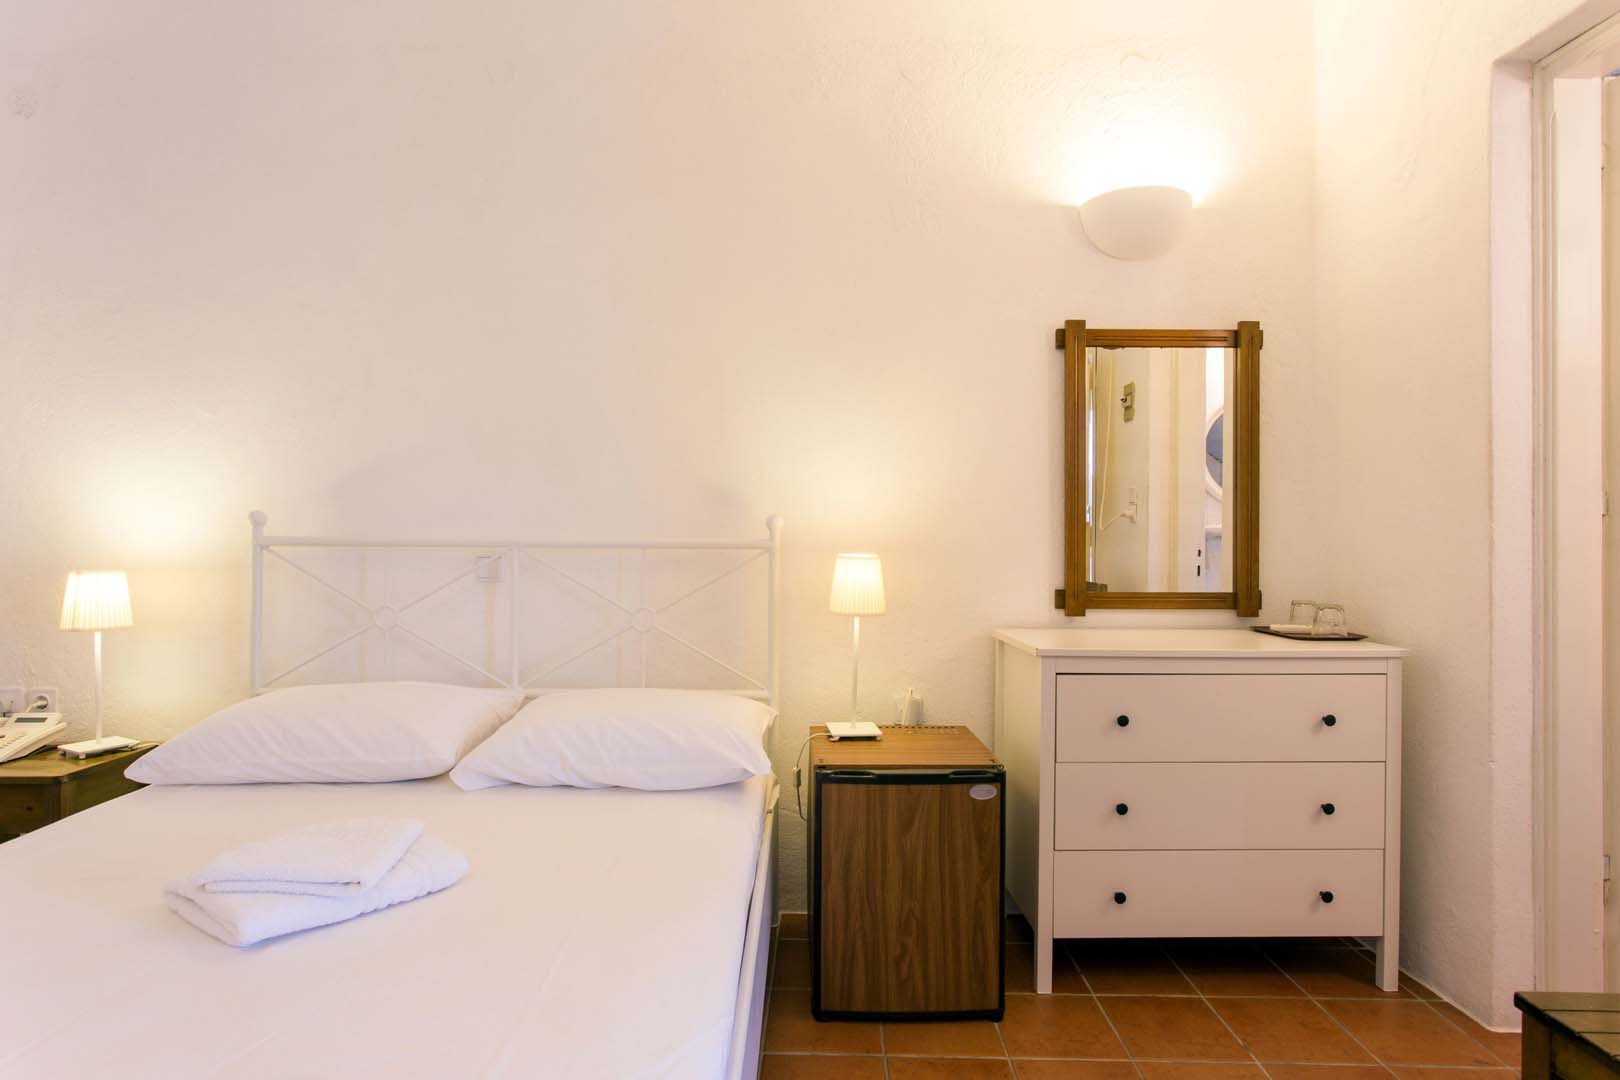 prix bedup top bed up prix if you intend to visit singapore during the grand prix with prix. Black Bedroom Furniture Sets. Home Design Ideas